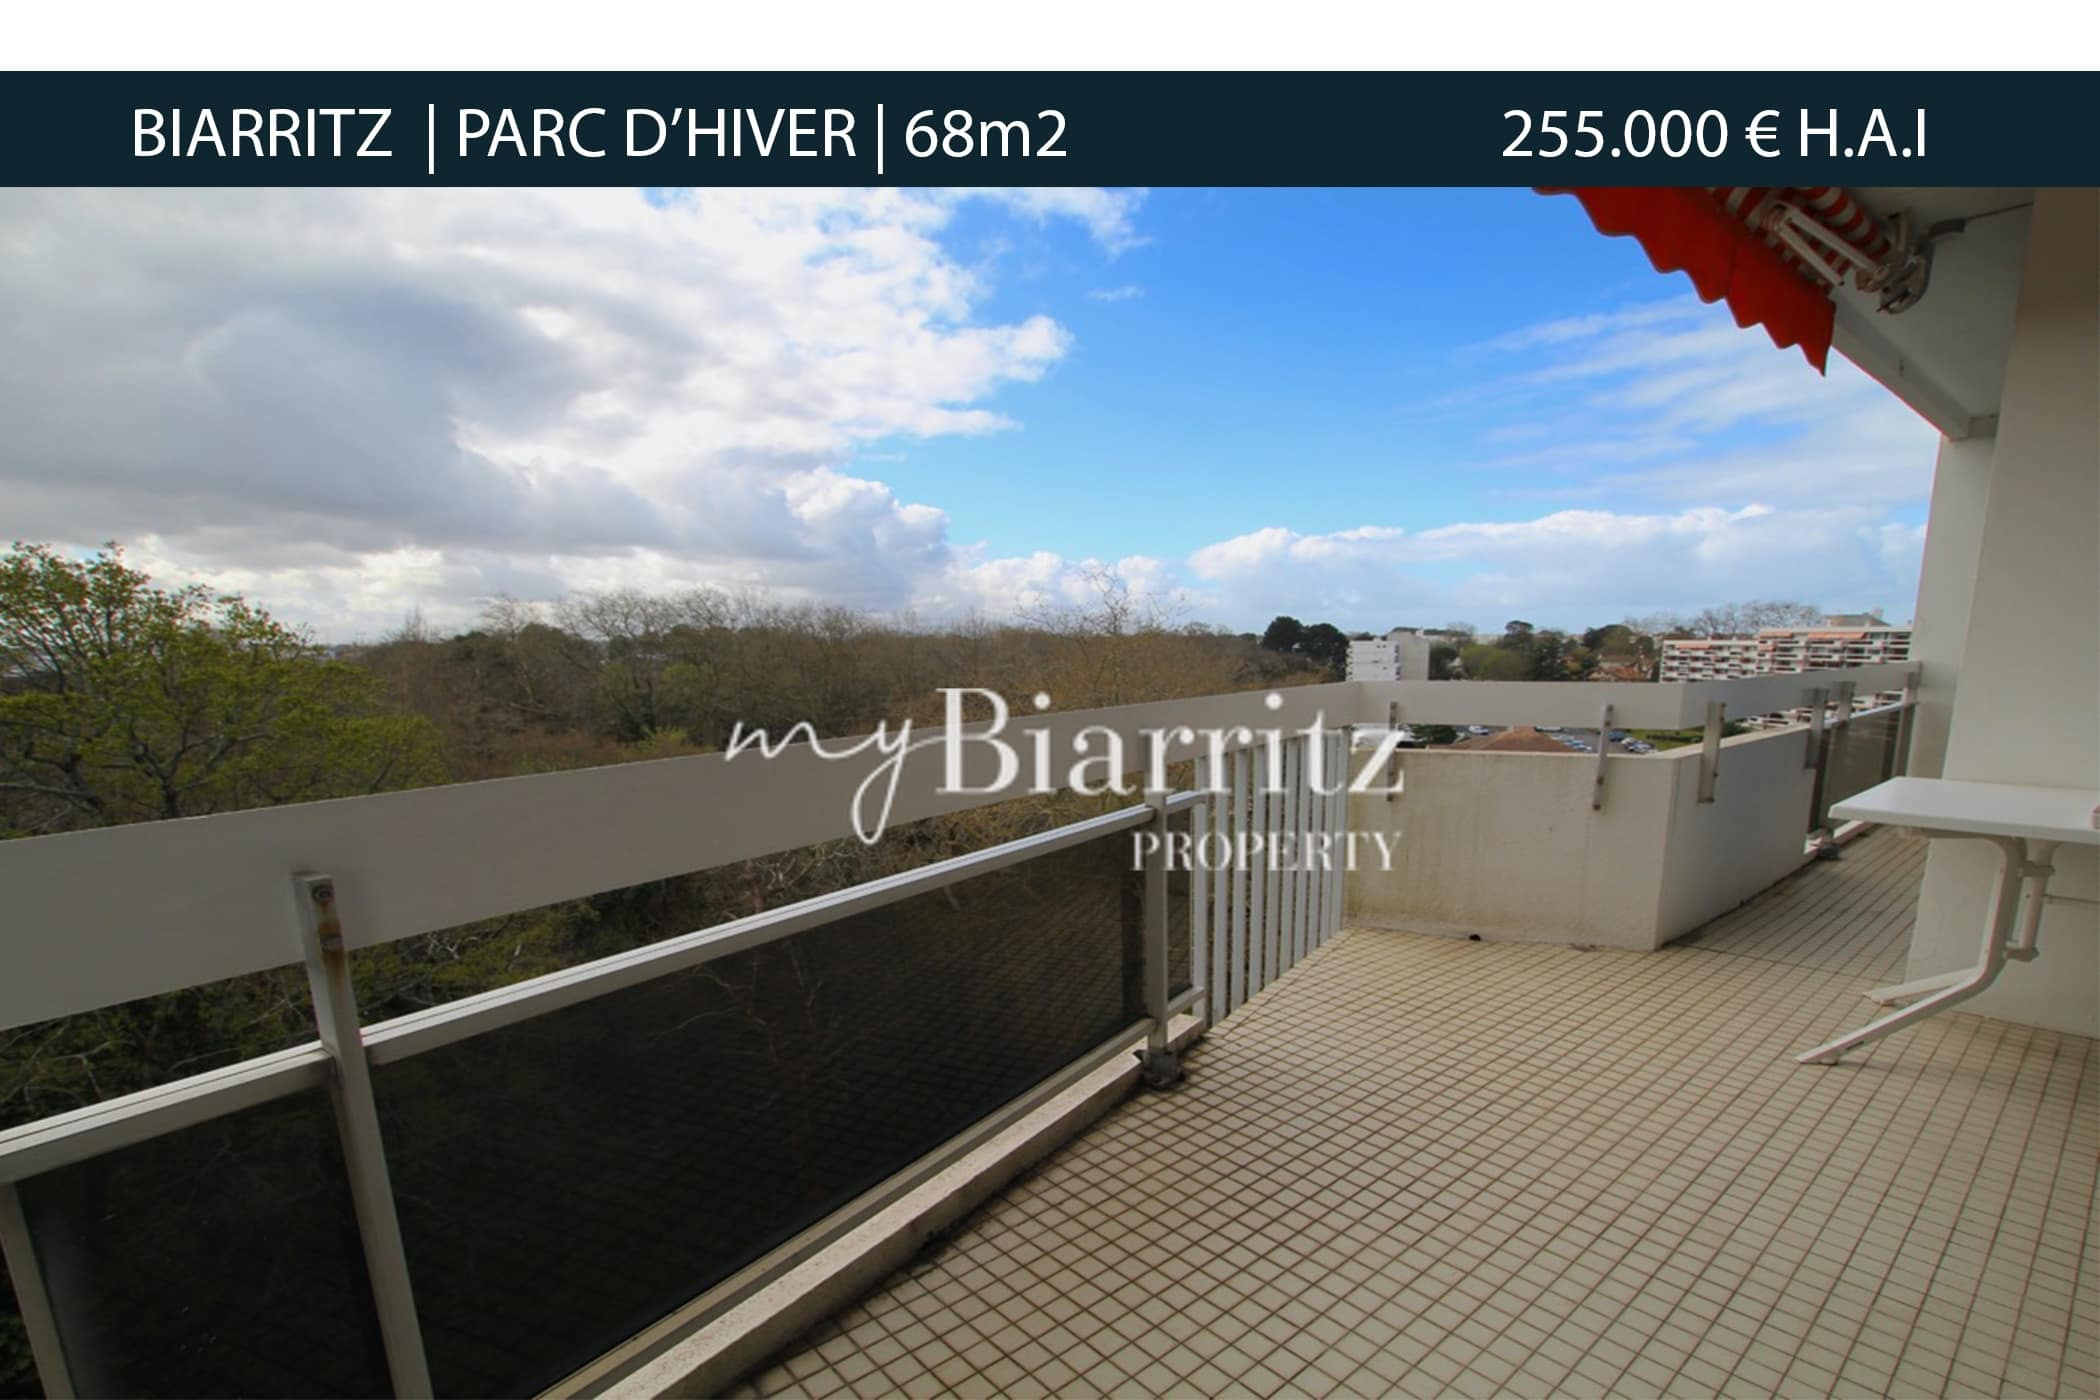 BIARRITZ-PARC-D-HIVER